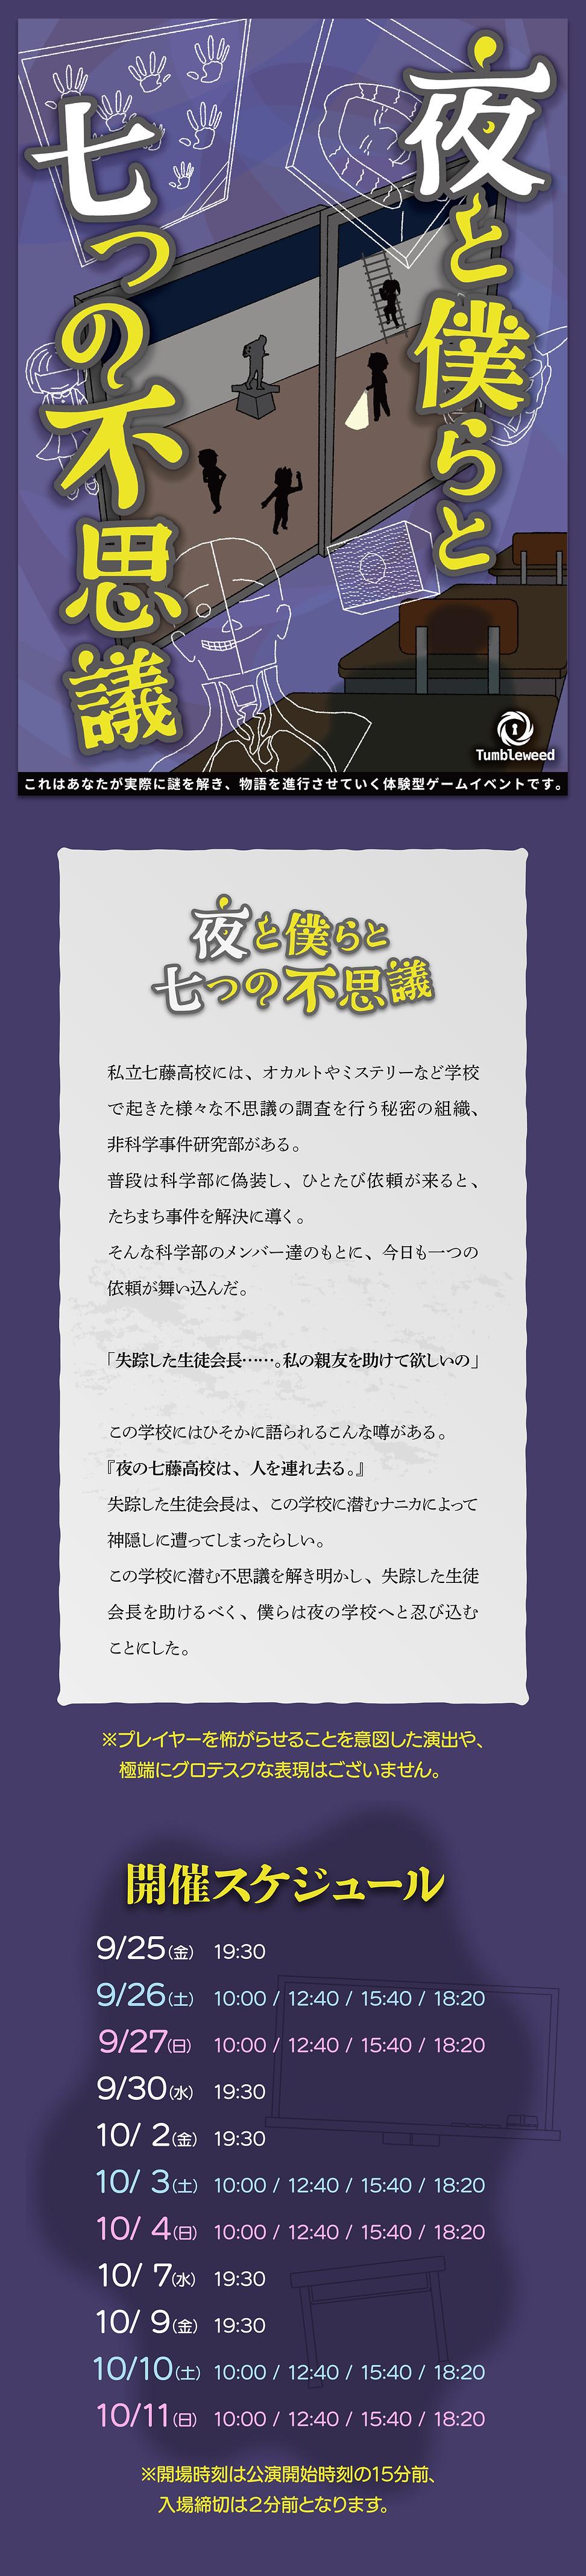 7husigi_1.jpg